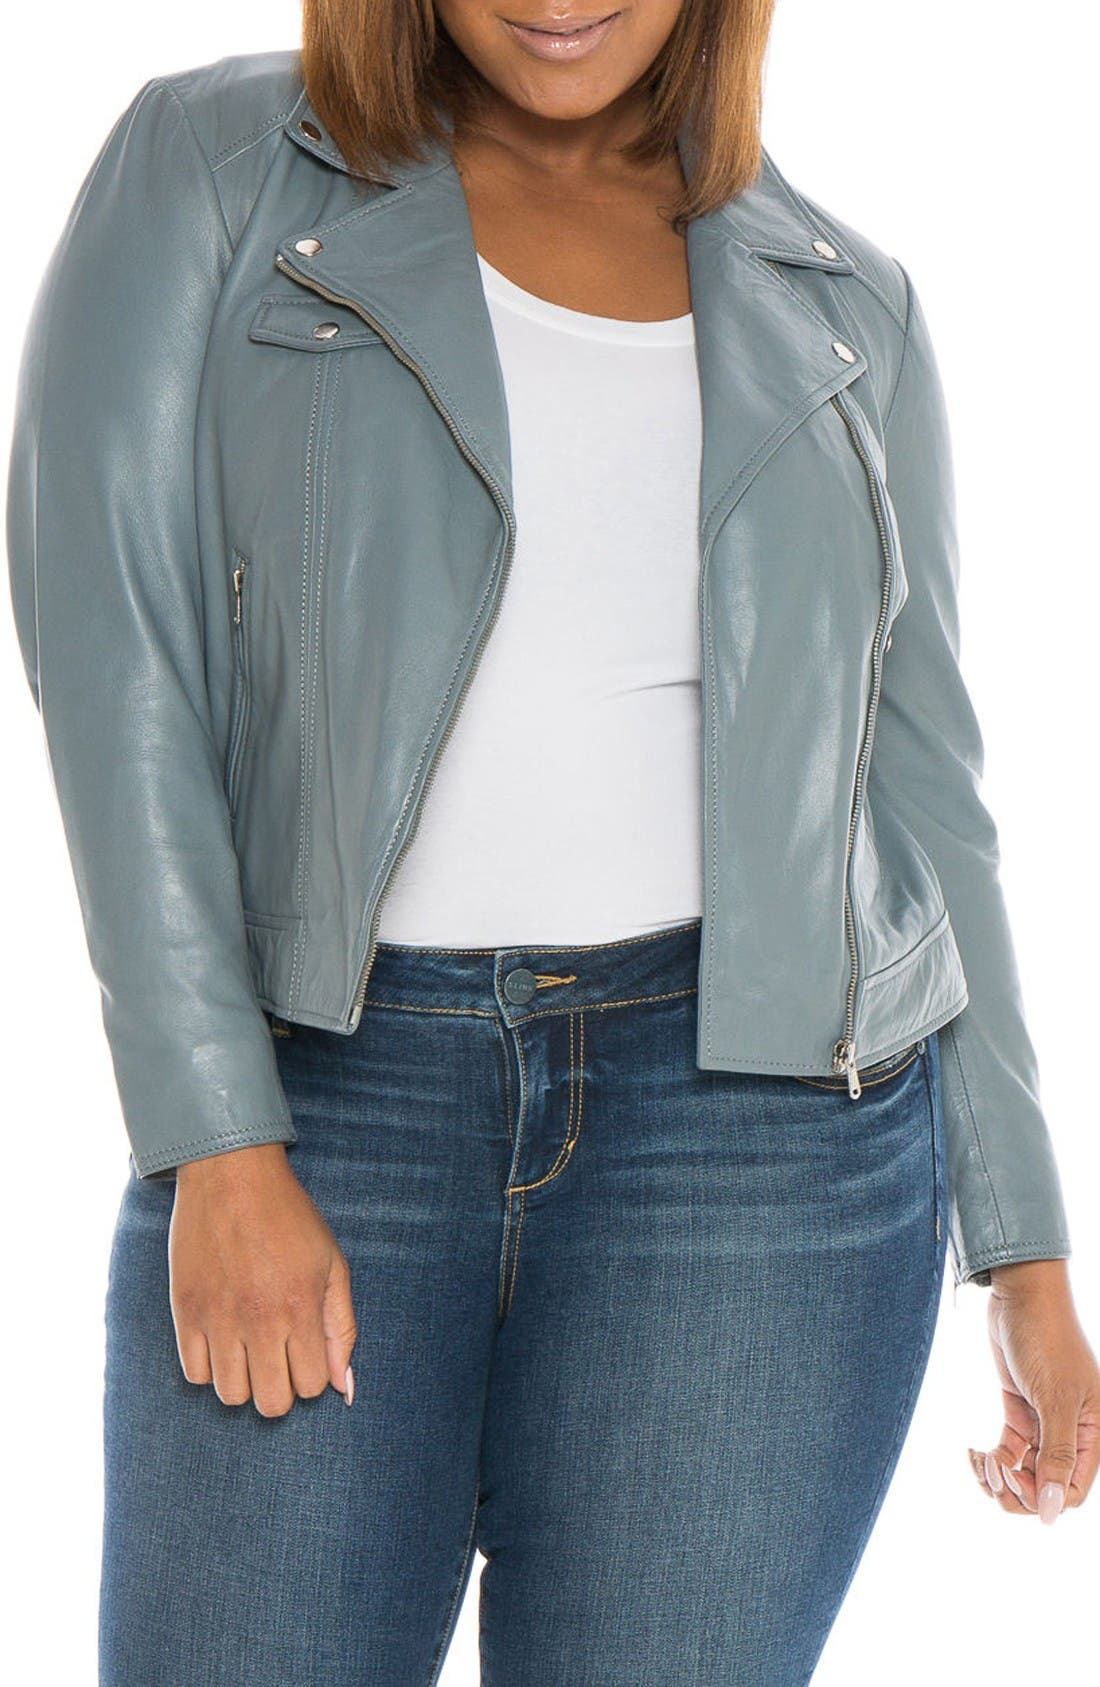 Alternate Image 1 Selected - SLINK Jeans Crop Leather Moto Jacket (Plus)